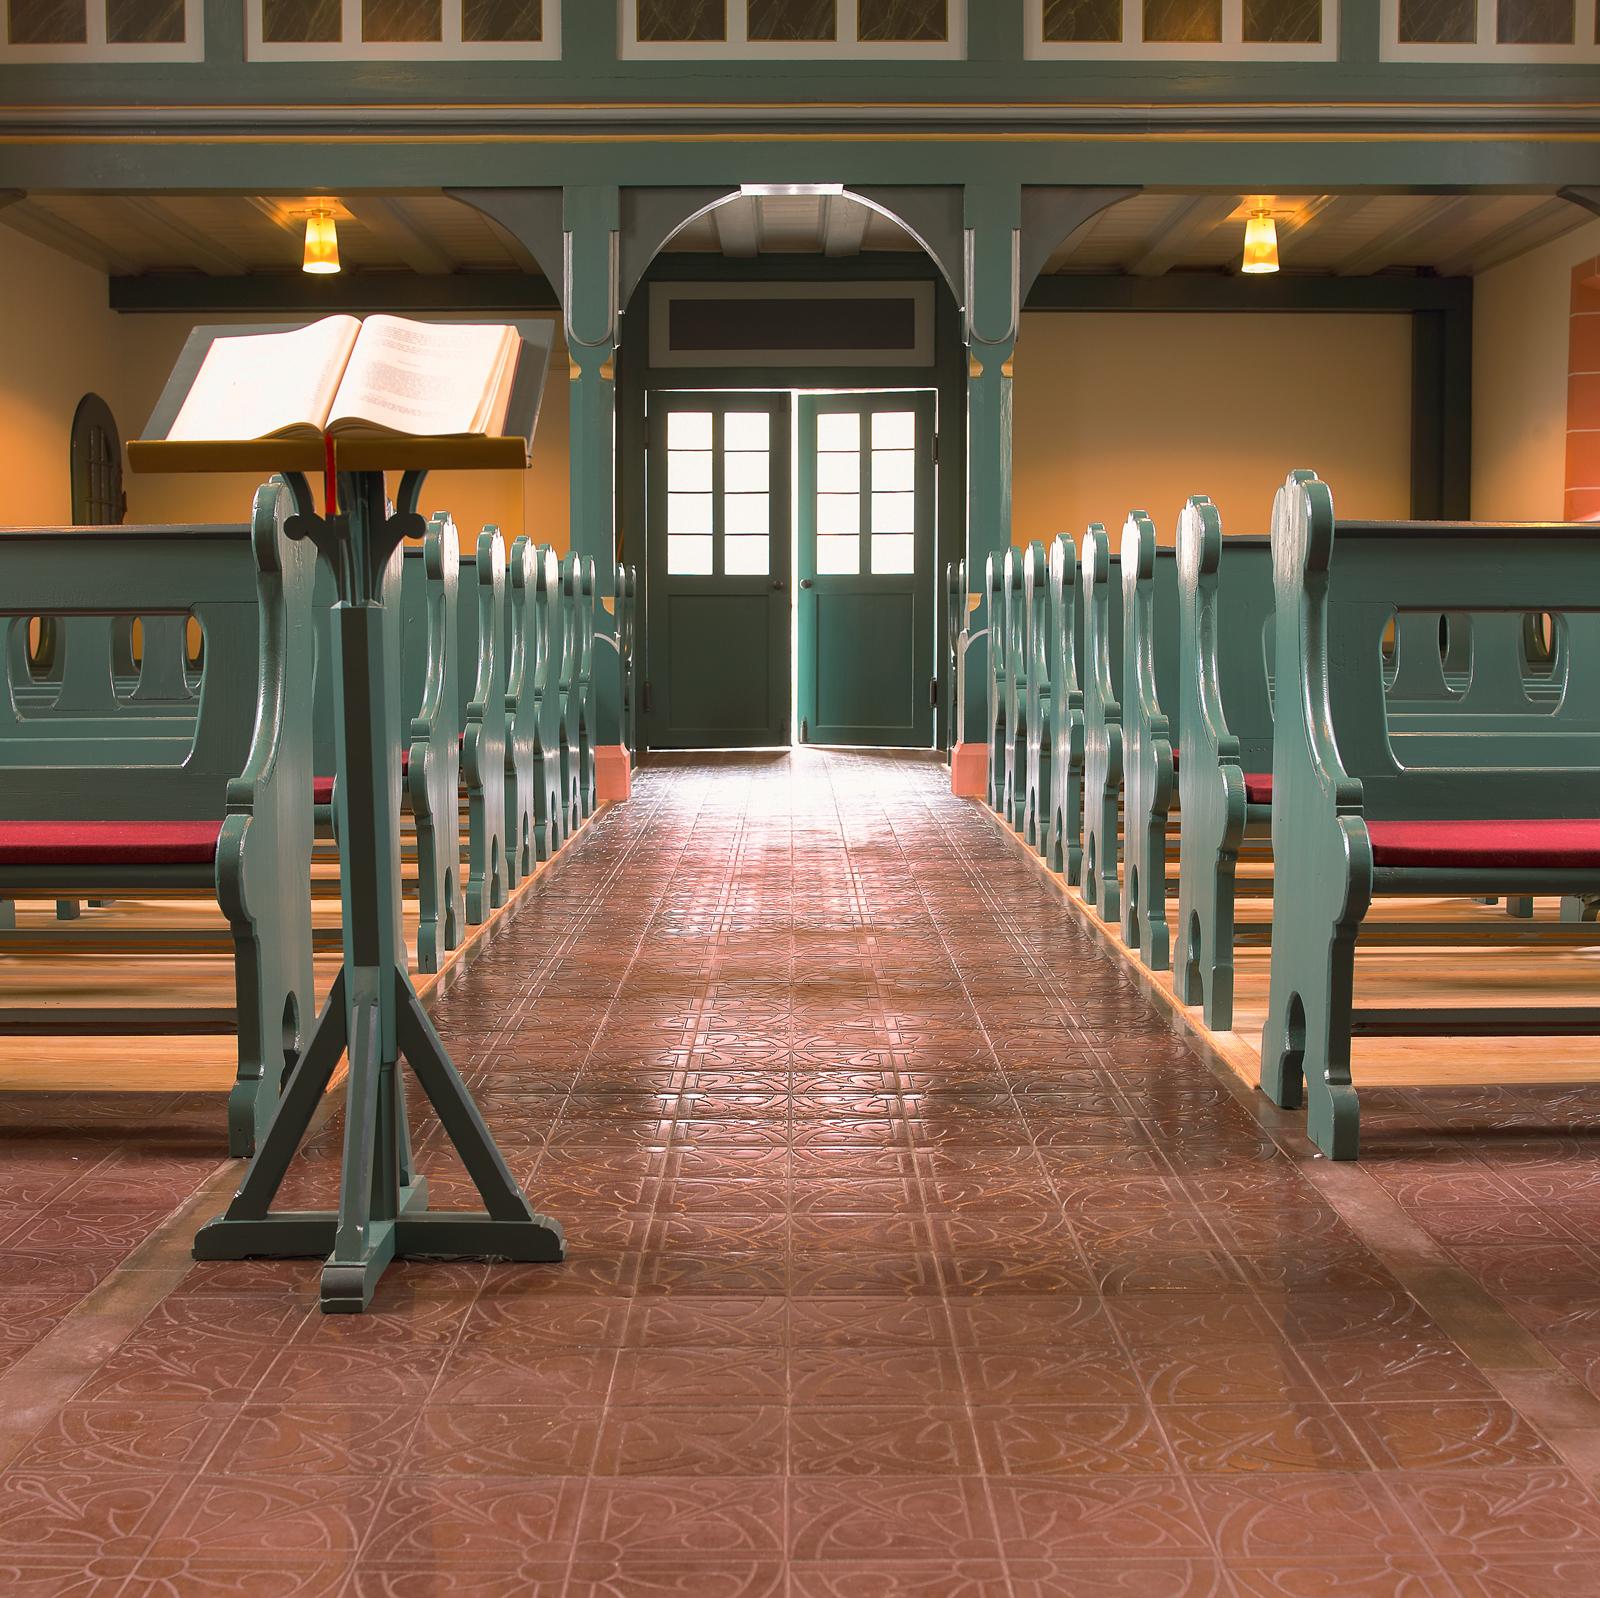 zementfliesen-terrazzofliesen-kreidefarbe-terrazzo-fugenlos-viaplatten-40234-kirche | 40234